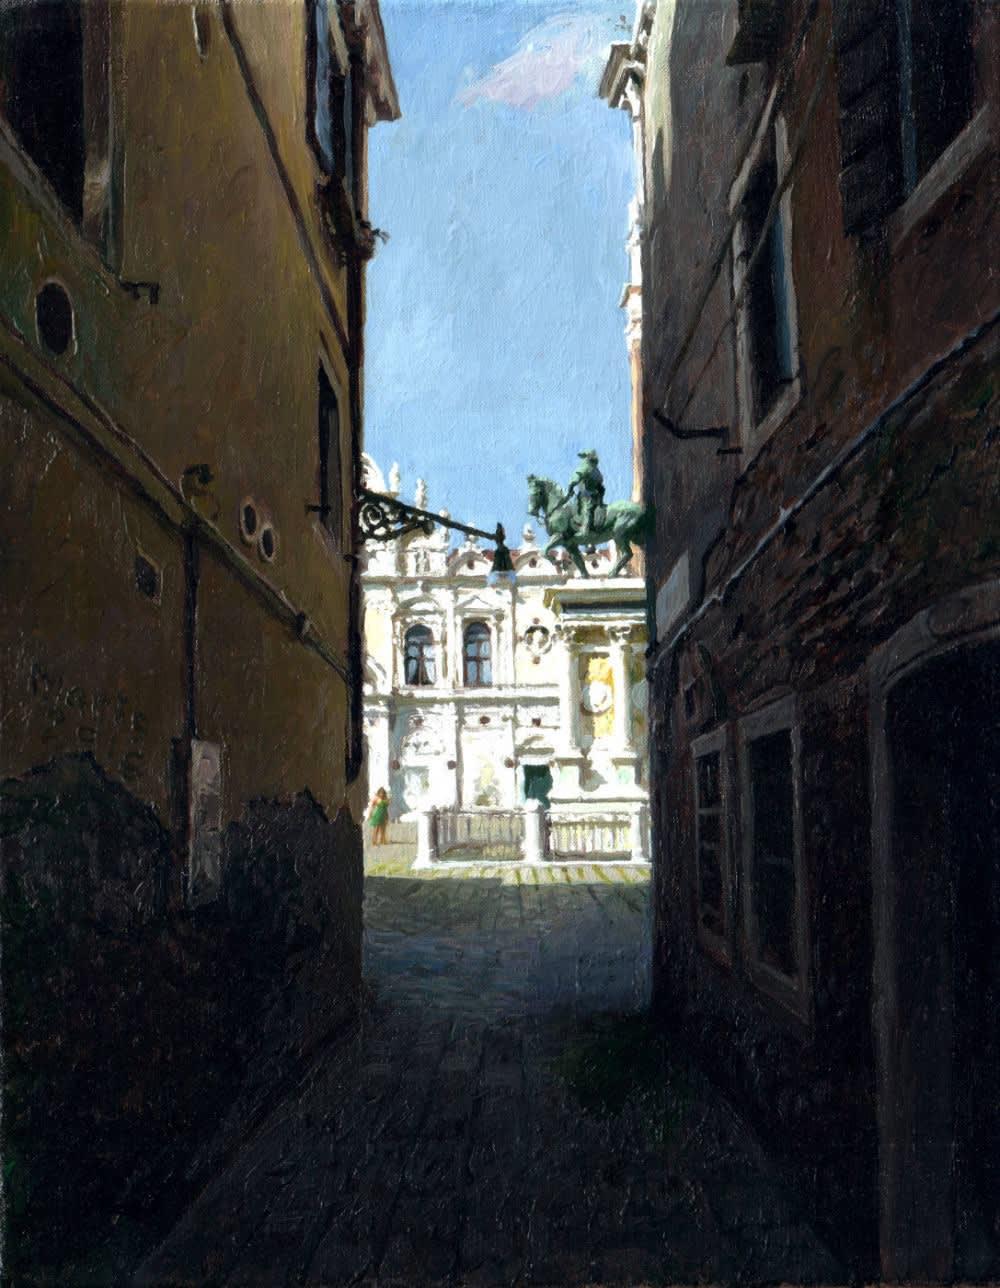 Jan Maris - Colleoni - 2016 - olieverf op doek - 34 x 27 cm